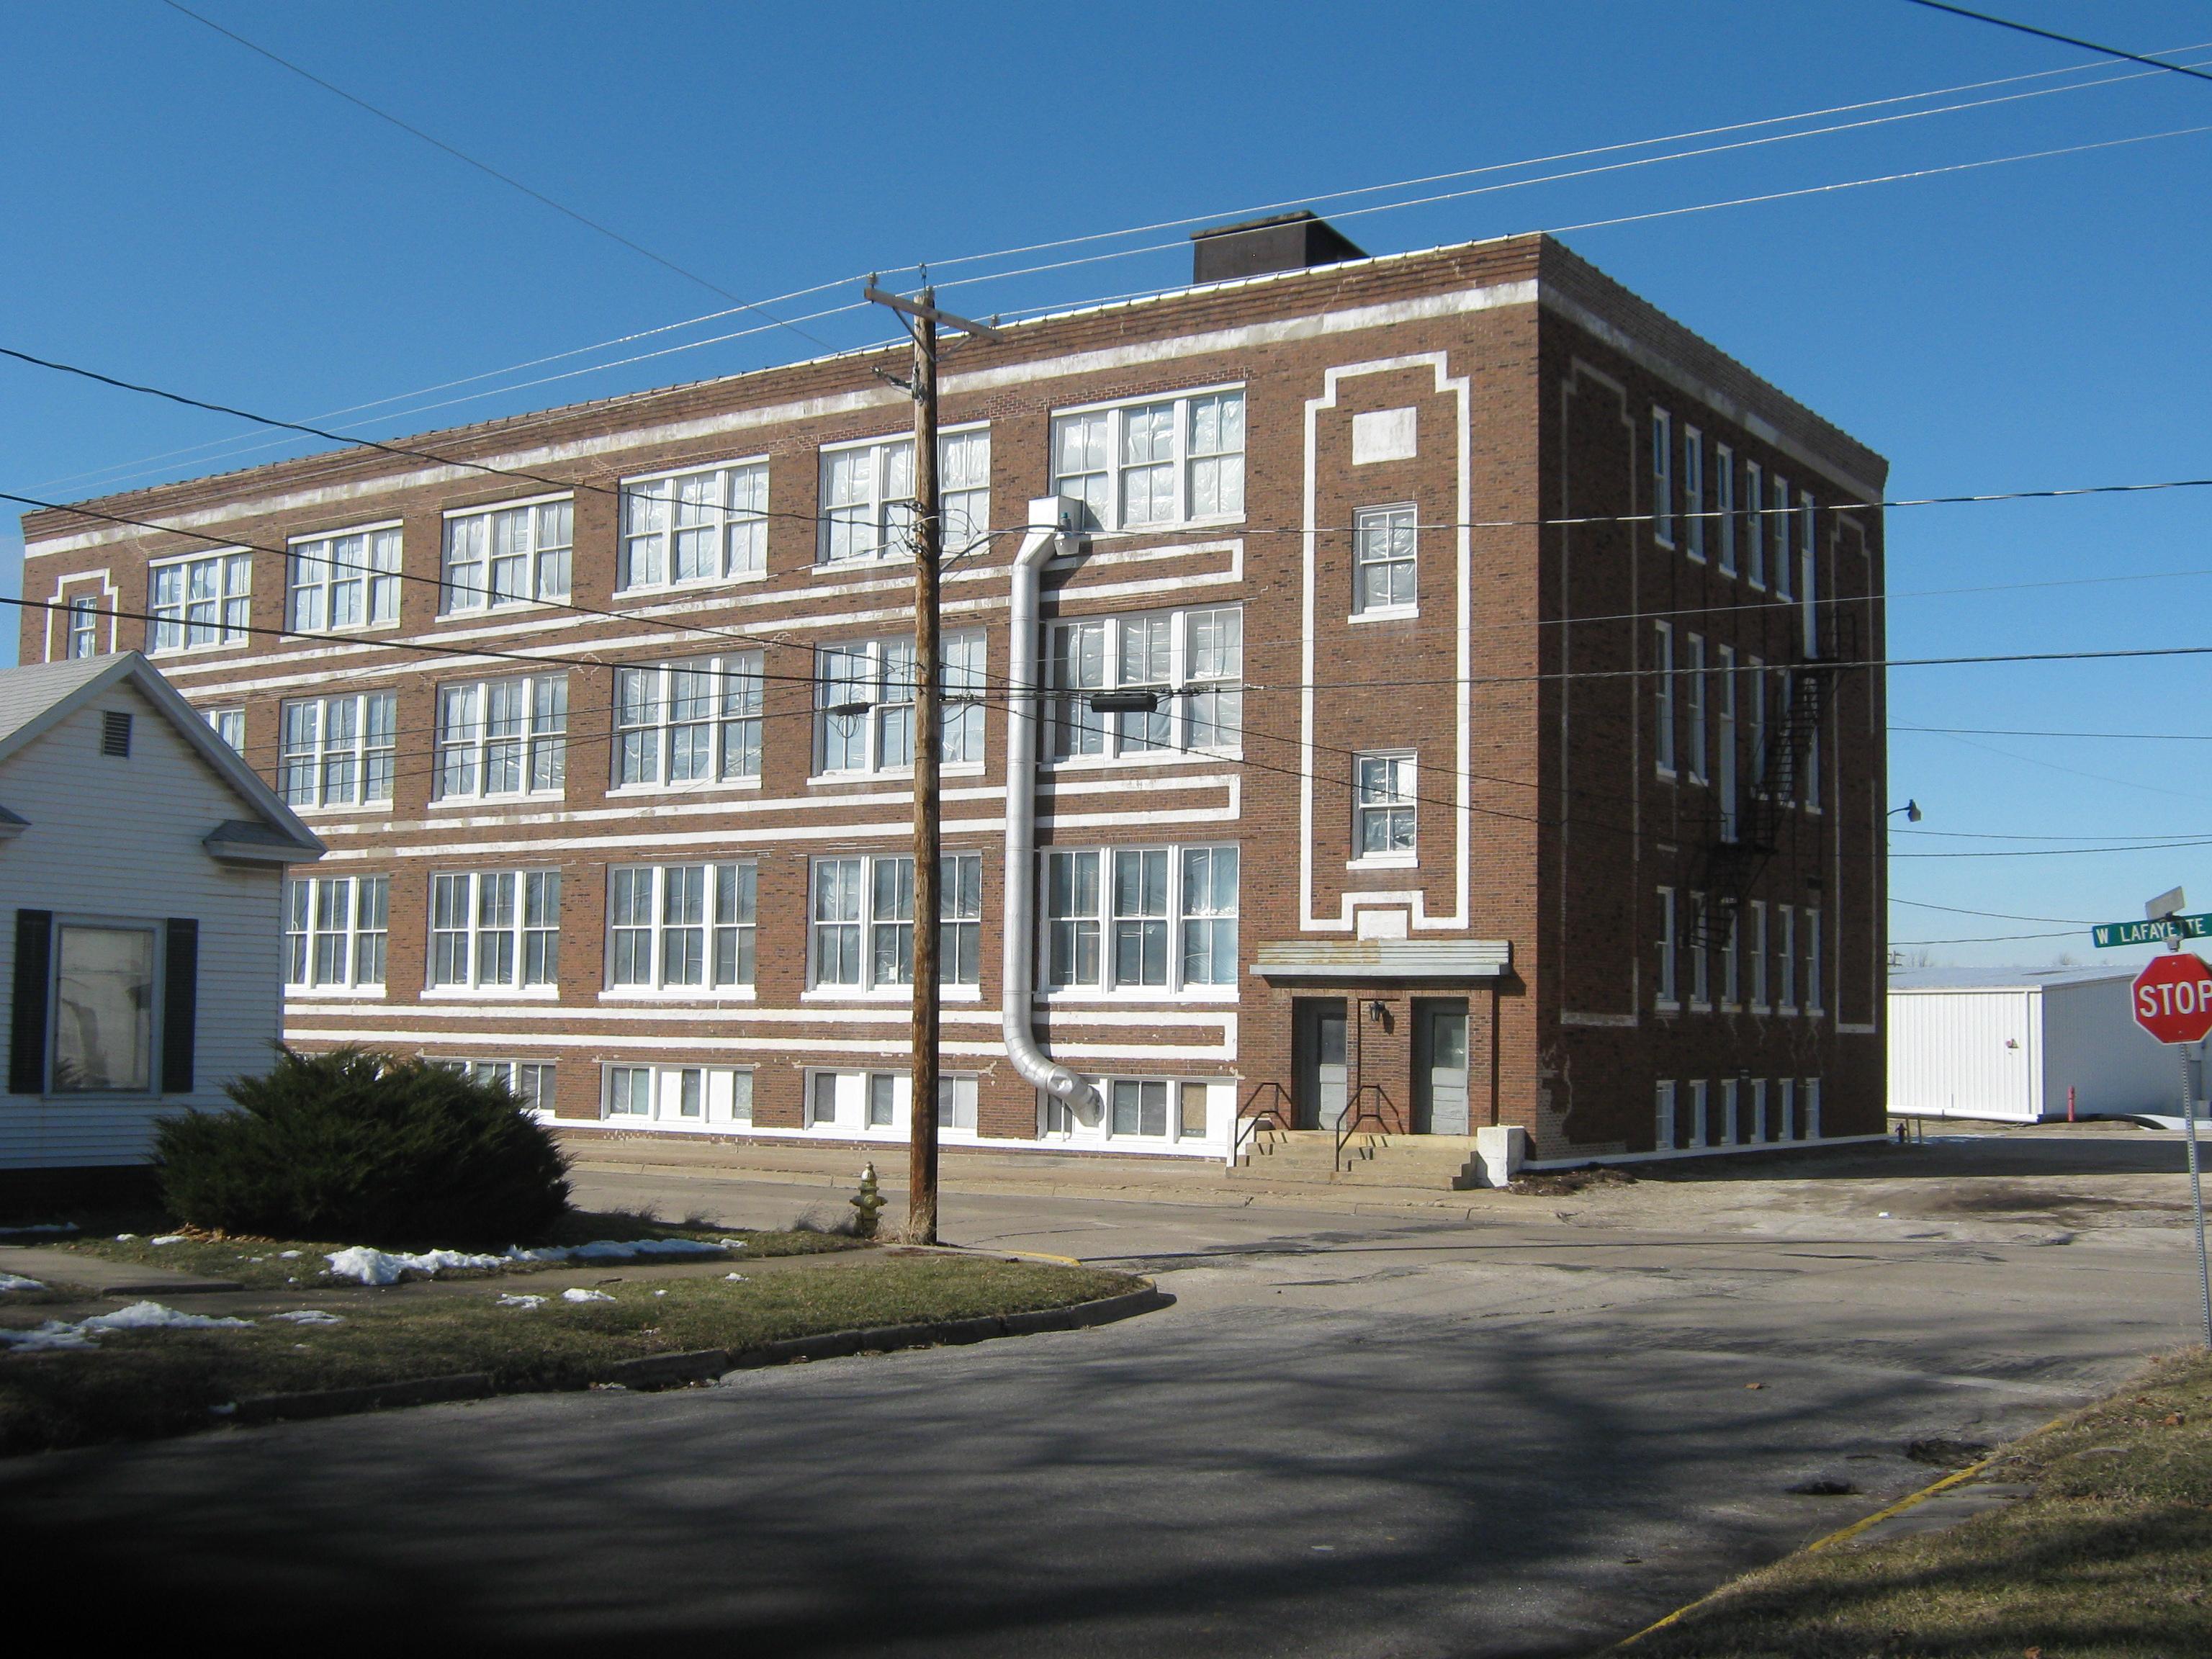 1930s Factory